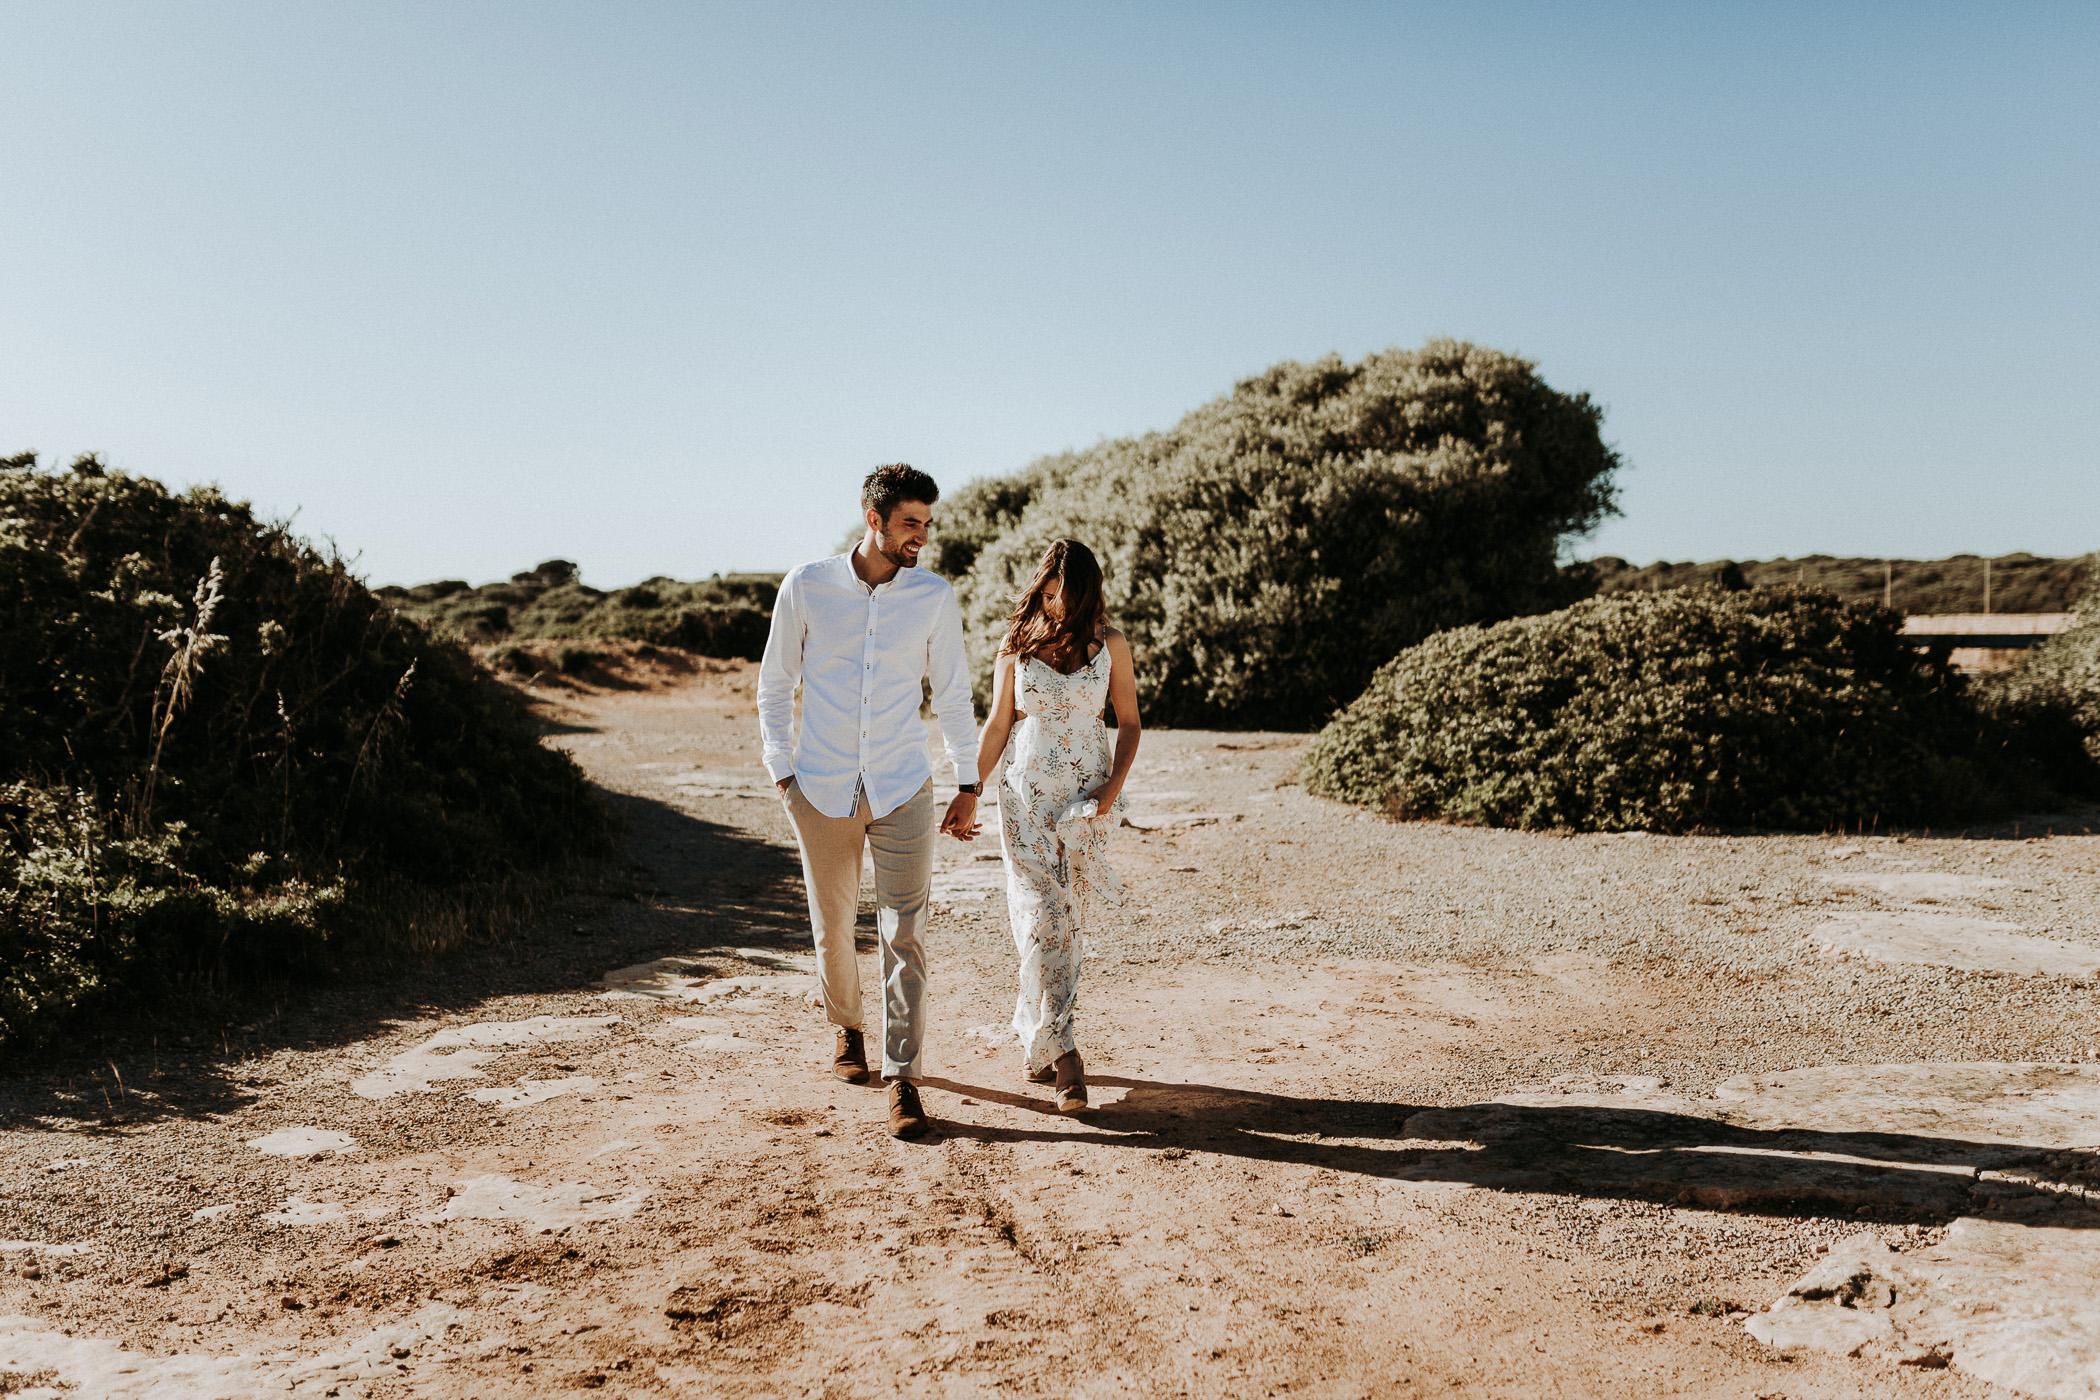 DanielaMarquardtPhotography_wedding_elopement_mallorca_spain_calapi_palma_lauraandtoni_3